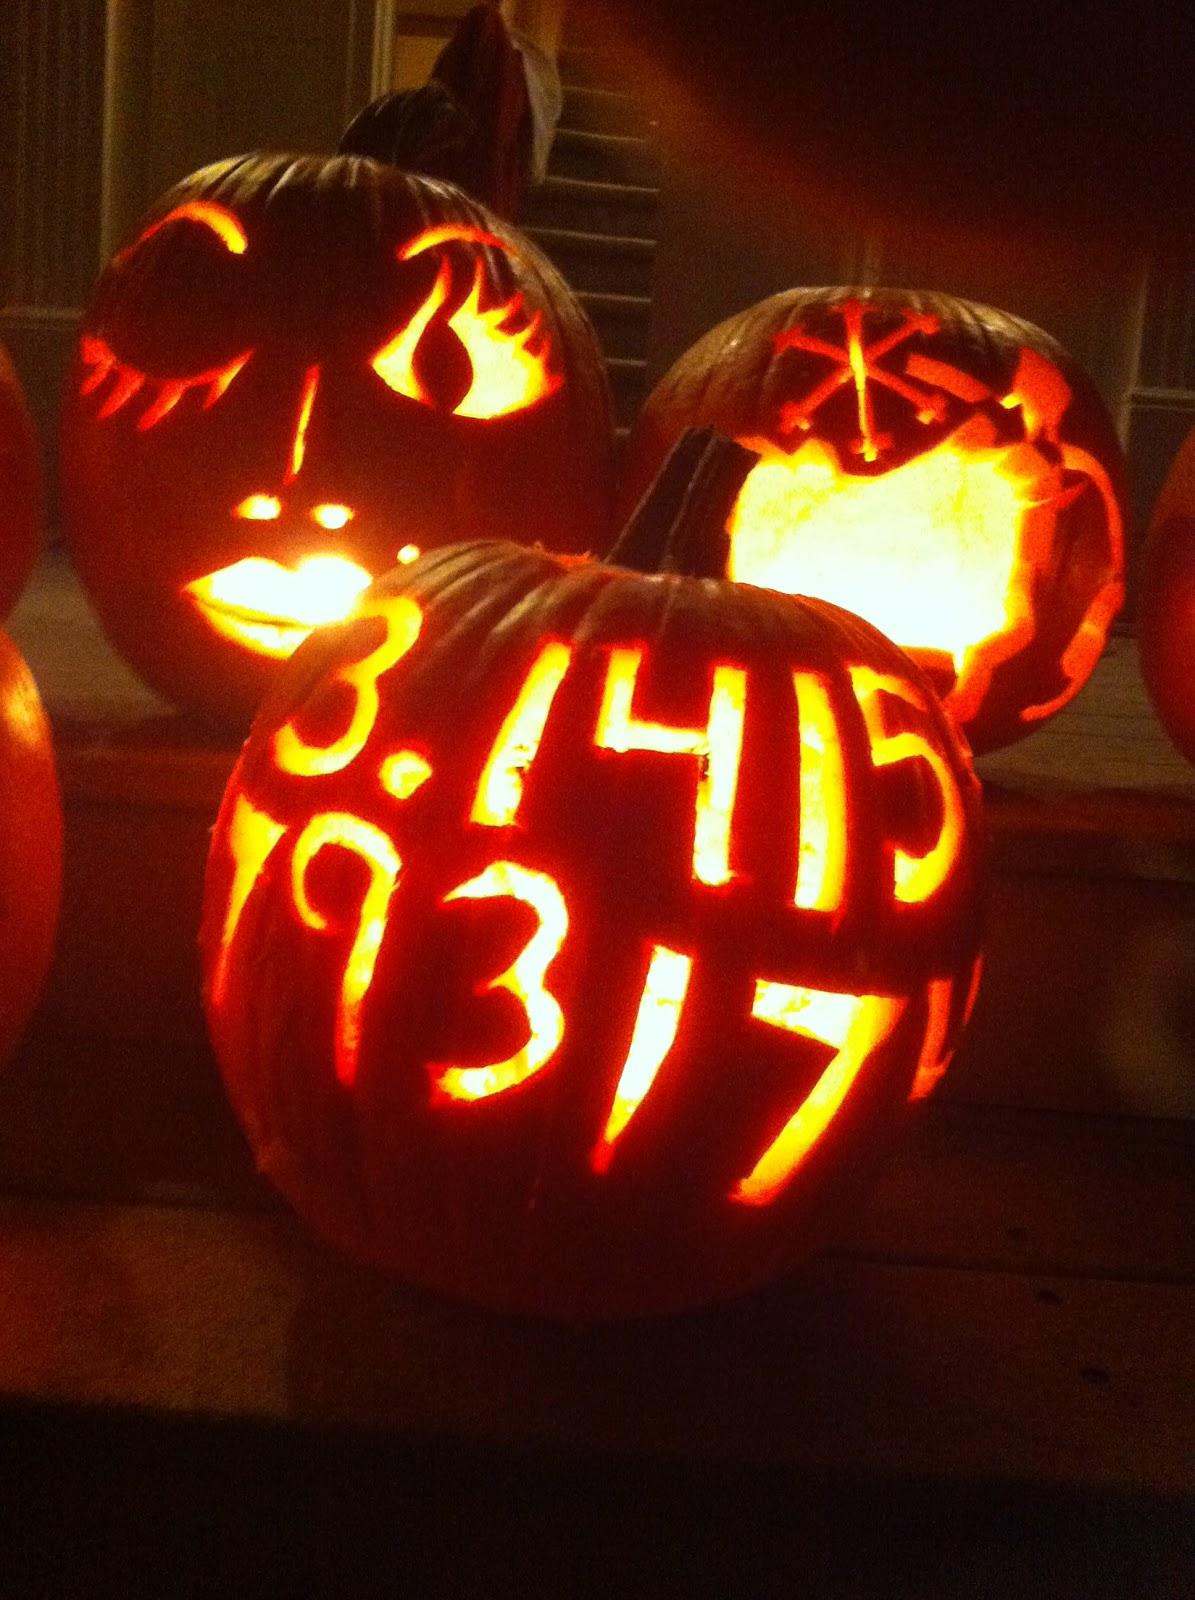 Williams college nordic ski team pumpkin carving